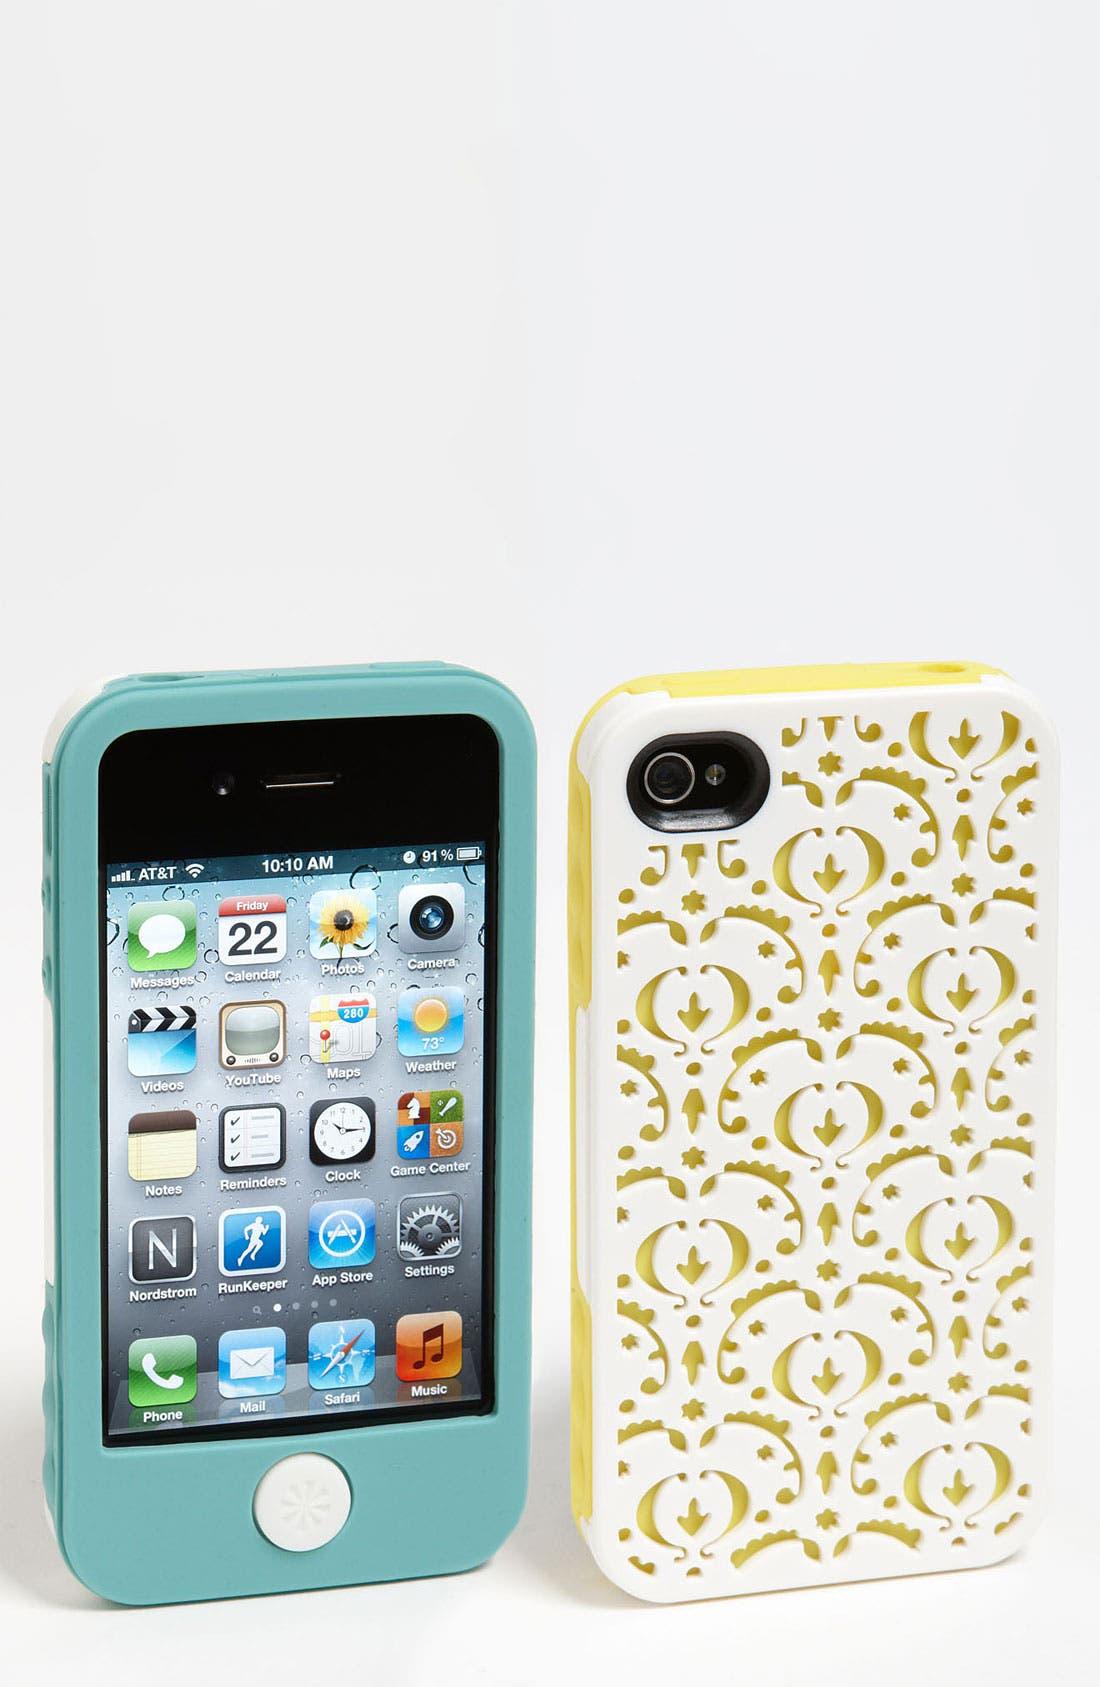 Main Image - Tech Candy 'Bordeaux' iPhone 4 & 4S Silicone Case Set